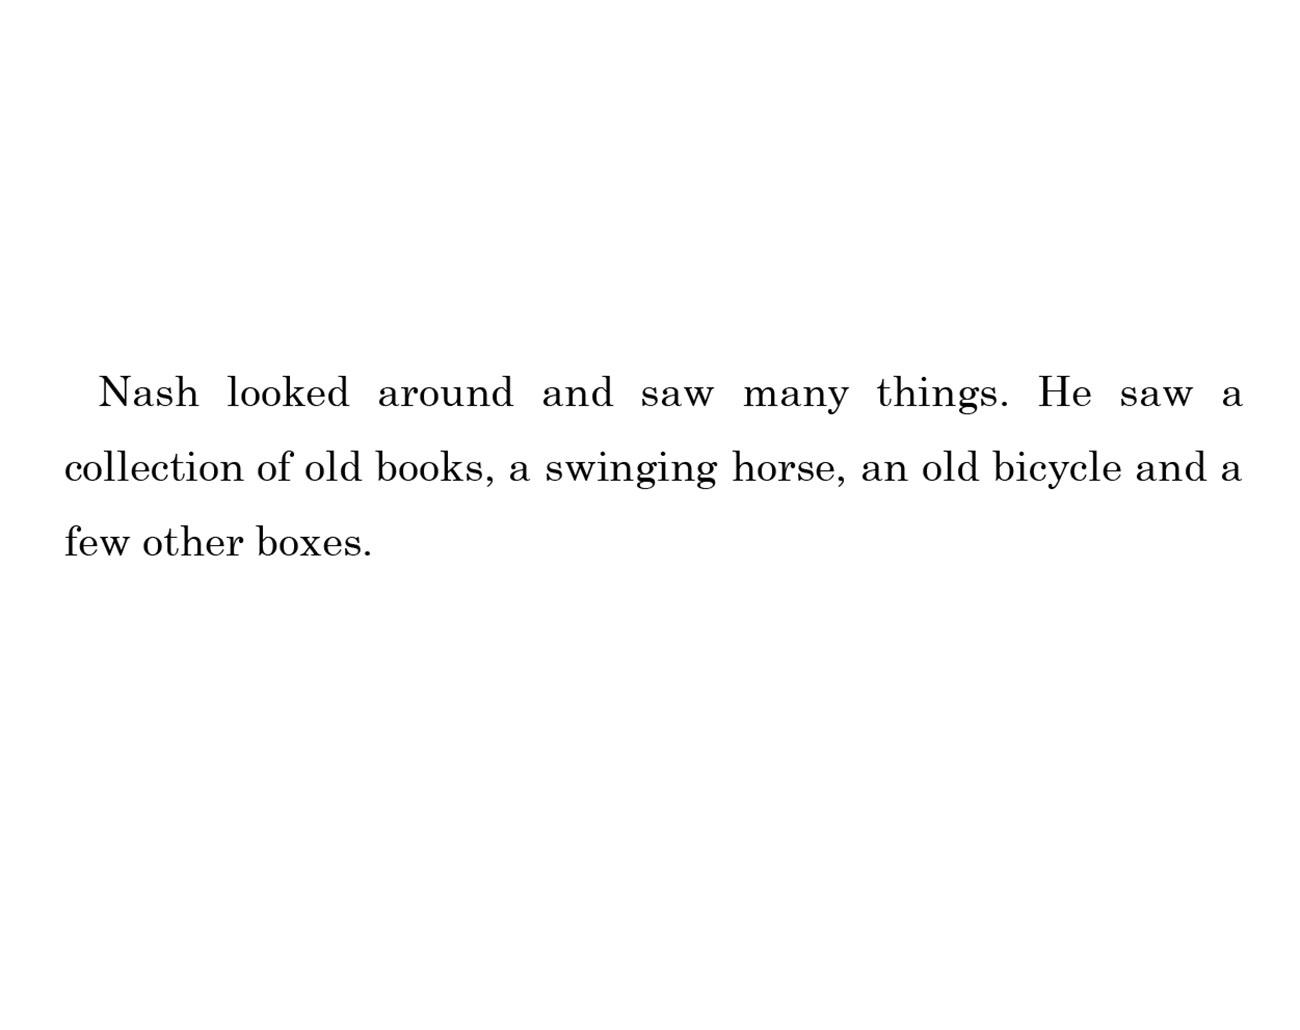 kids short story 'Down the memory lane with nash' by uma bala devarakonda - page 12